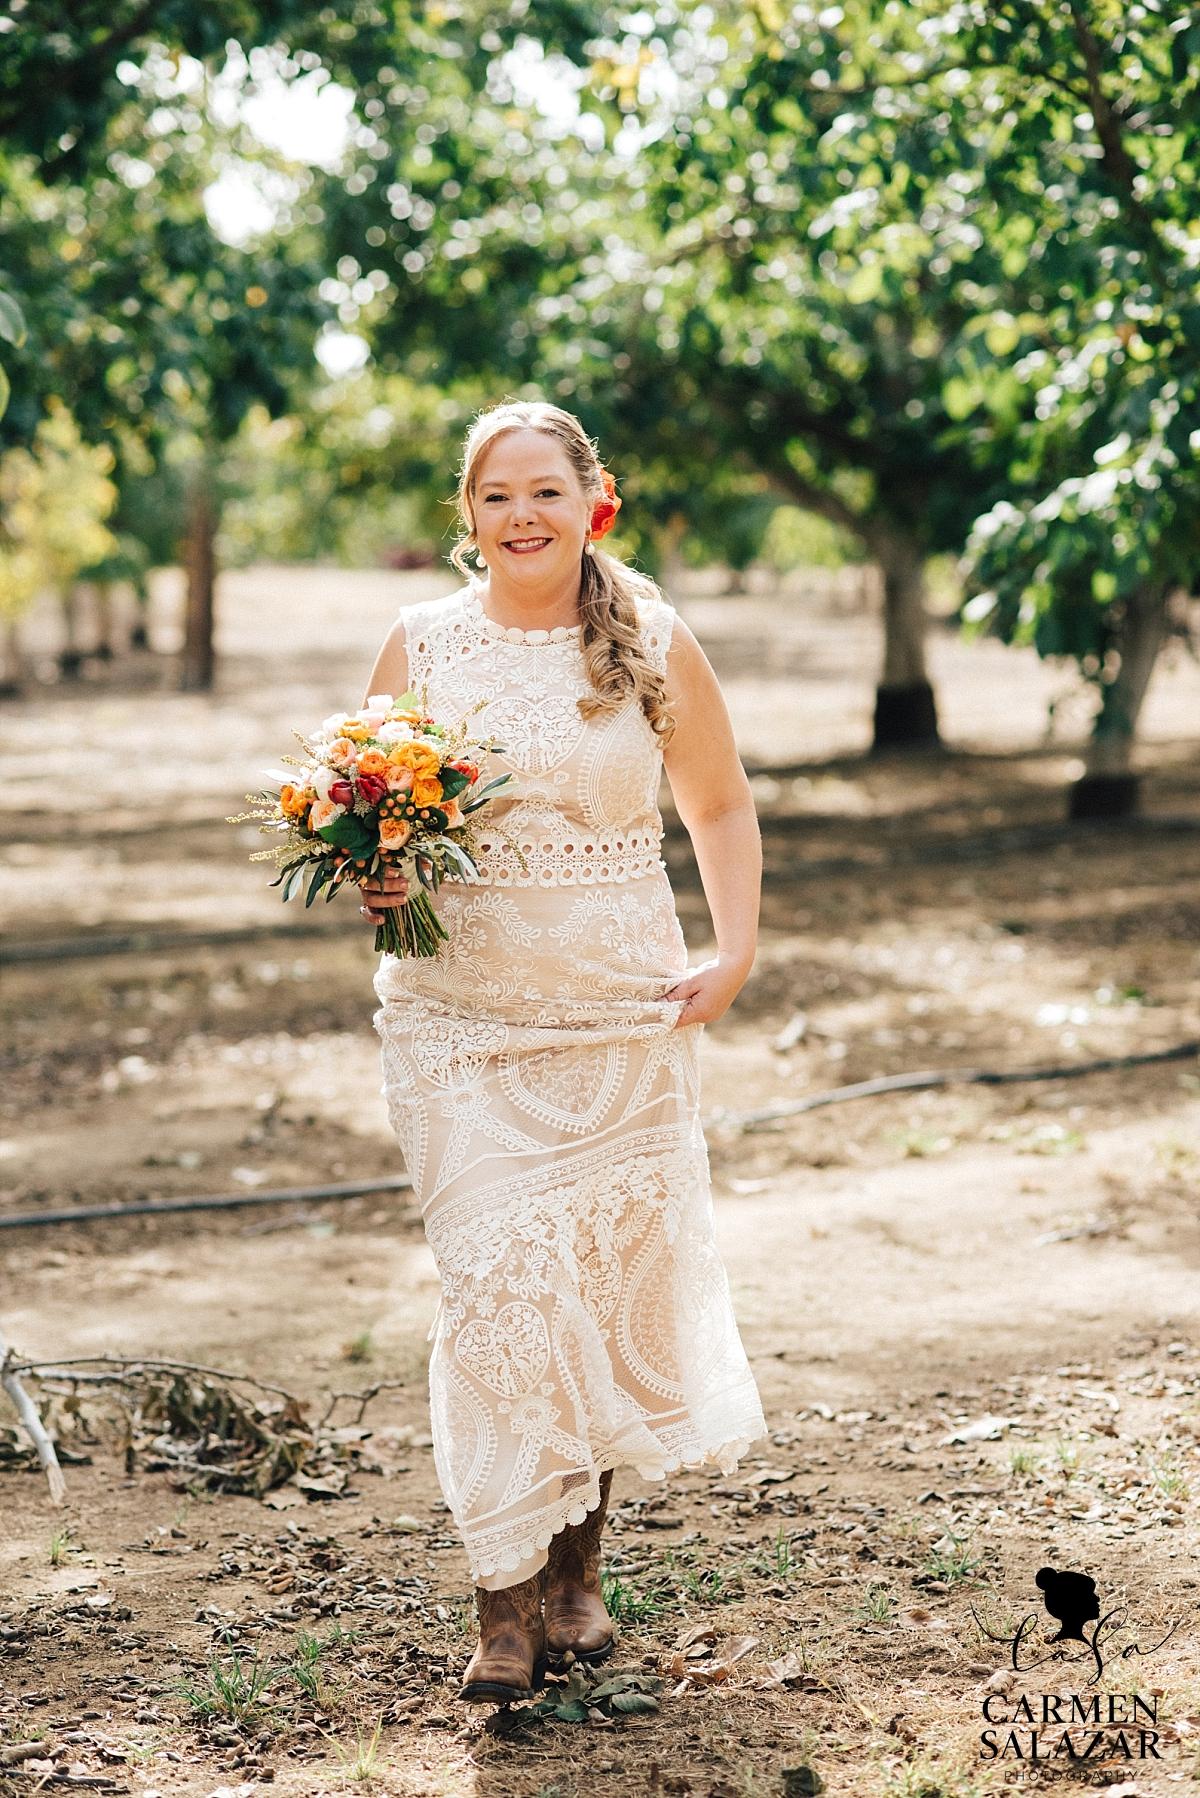 Beautiful Winters bride in family orchard - Carmen Salazar